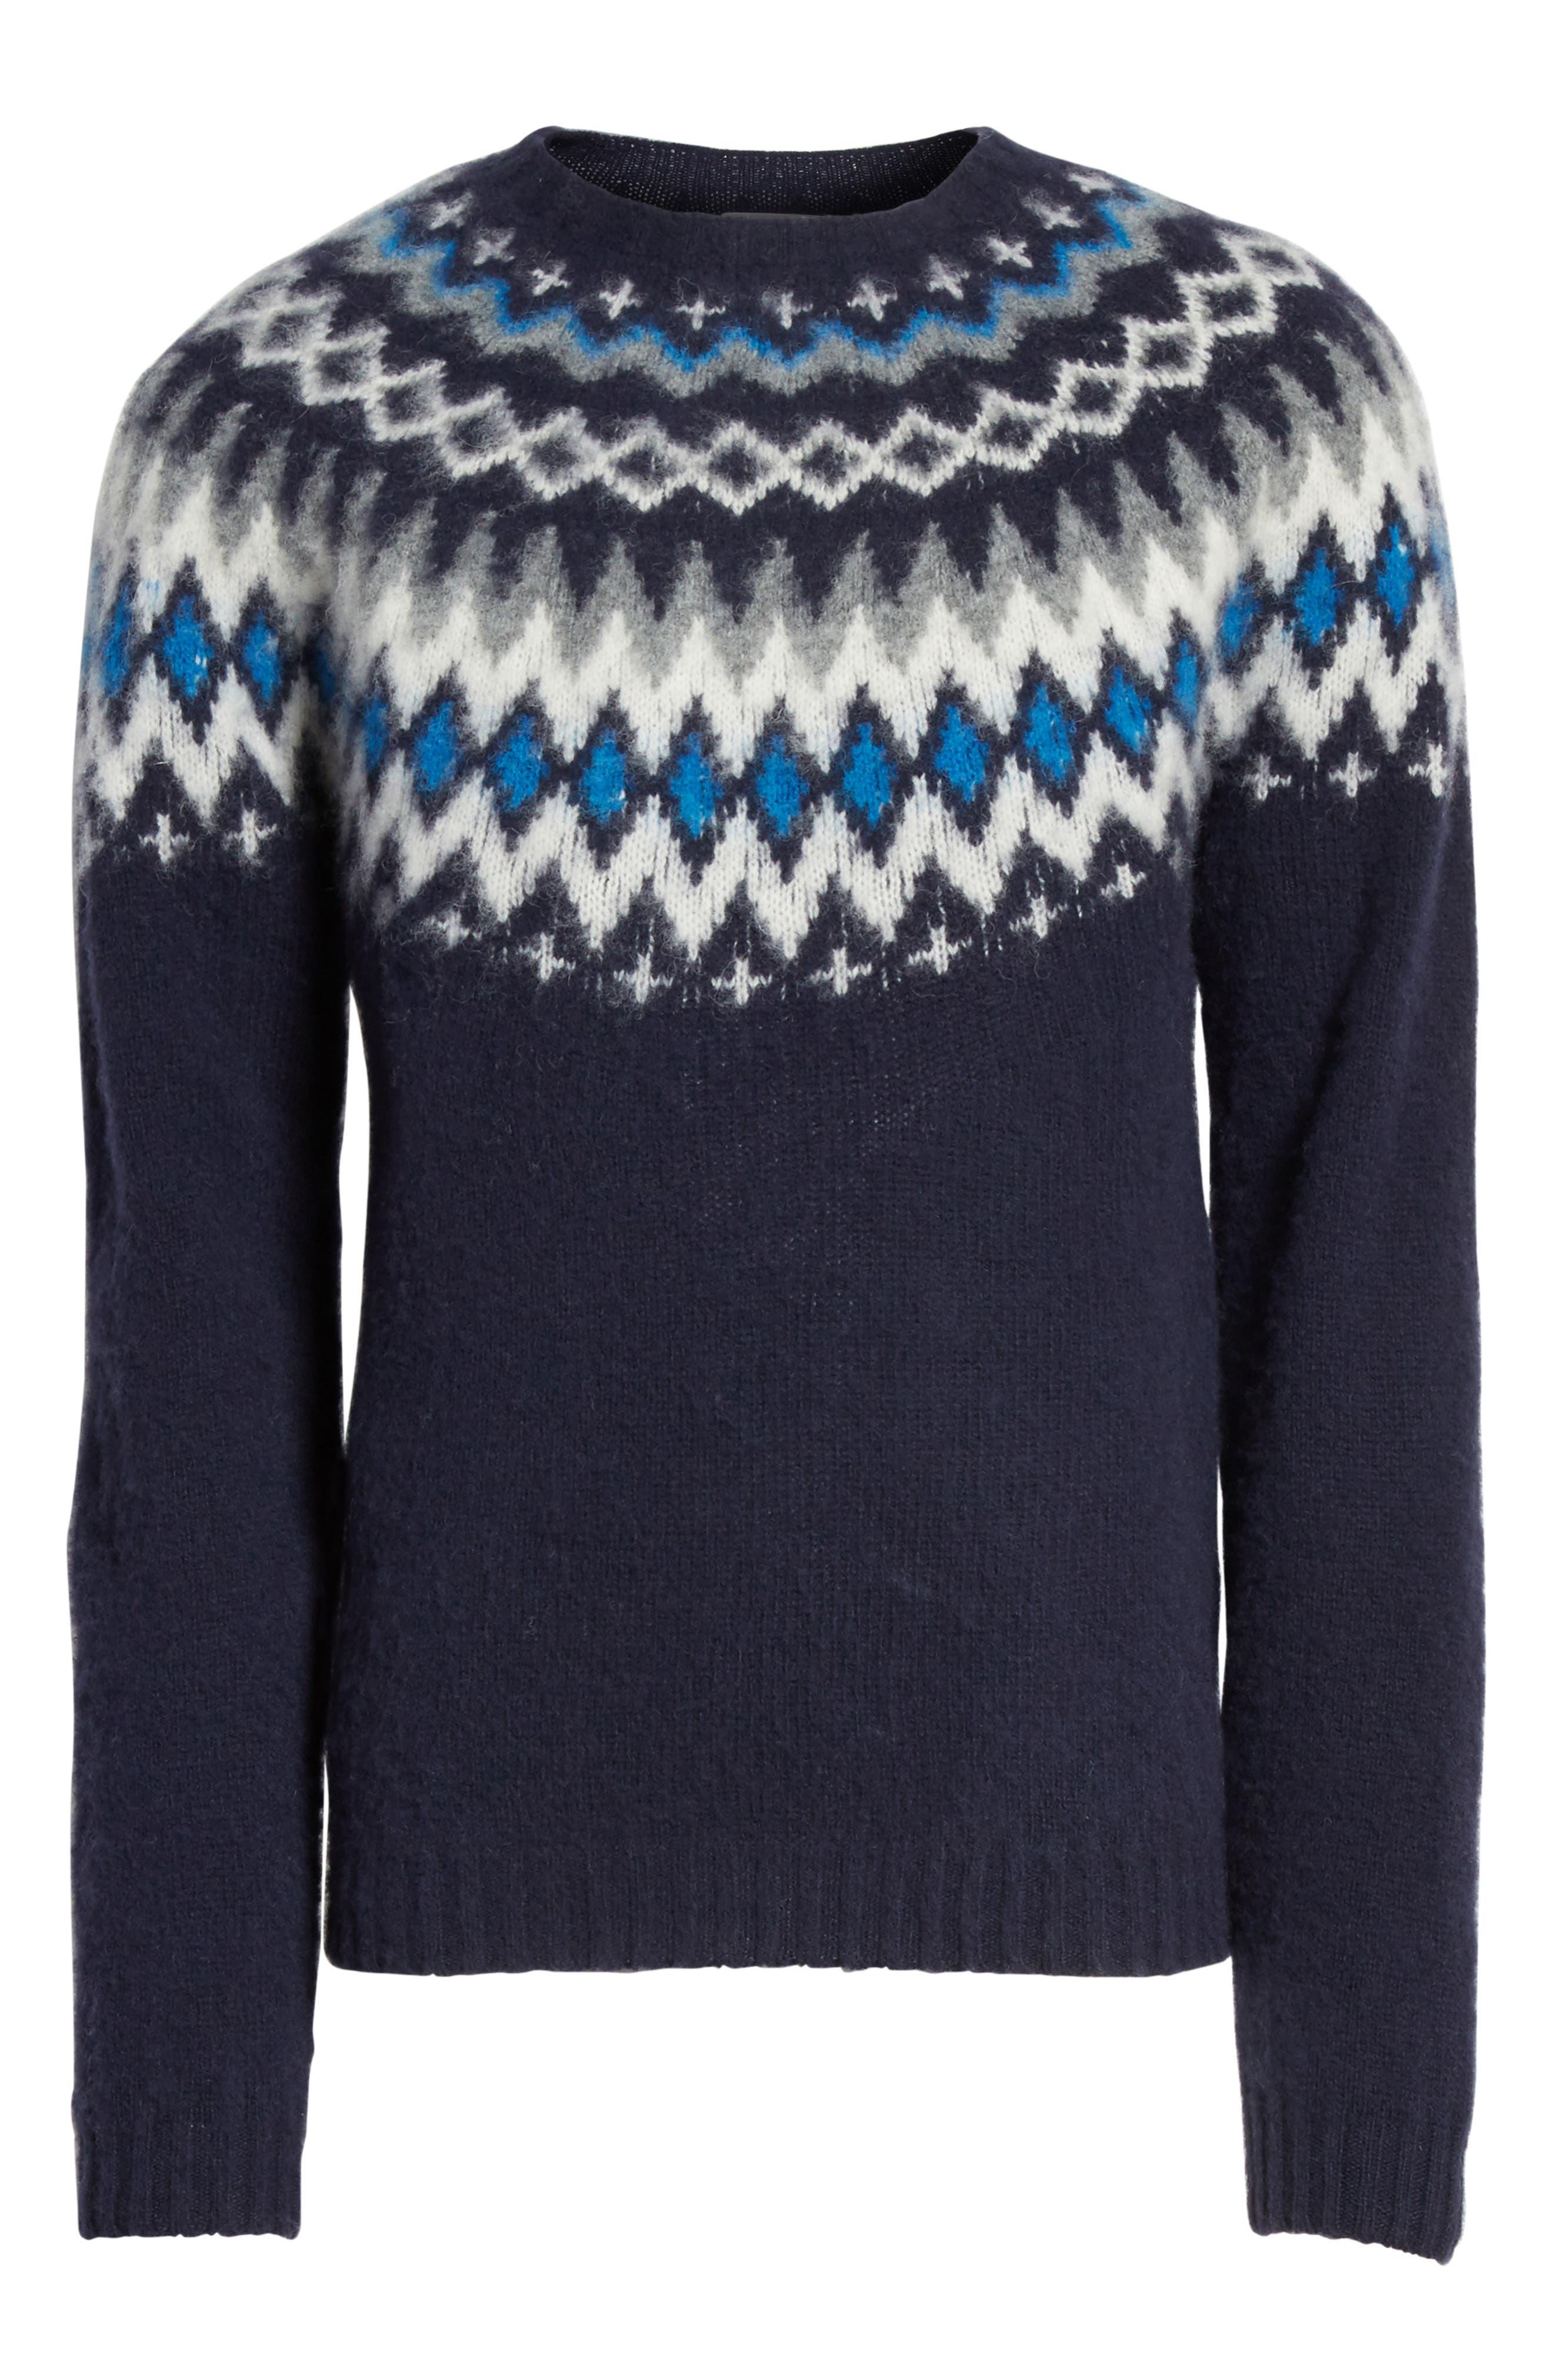 Nirnir Fair Isle Lambswool Sweater,                             Alternate thumbnail 6, color,                             Navy